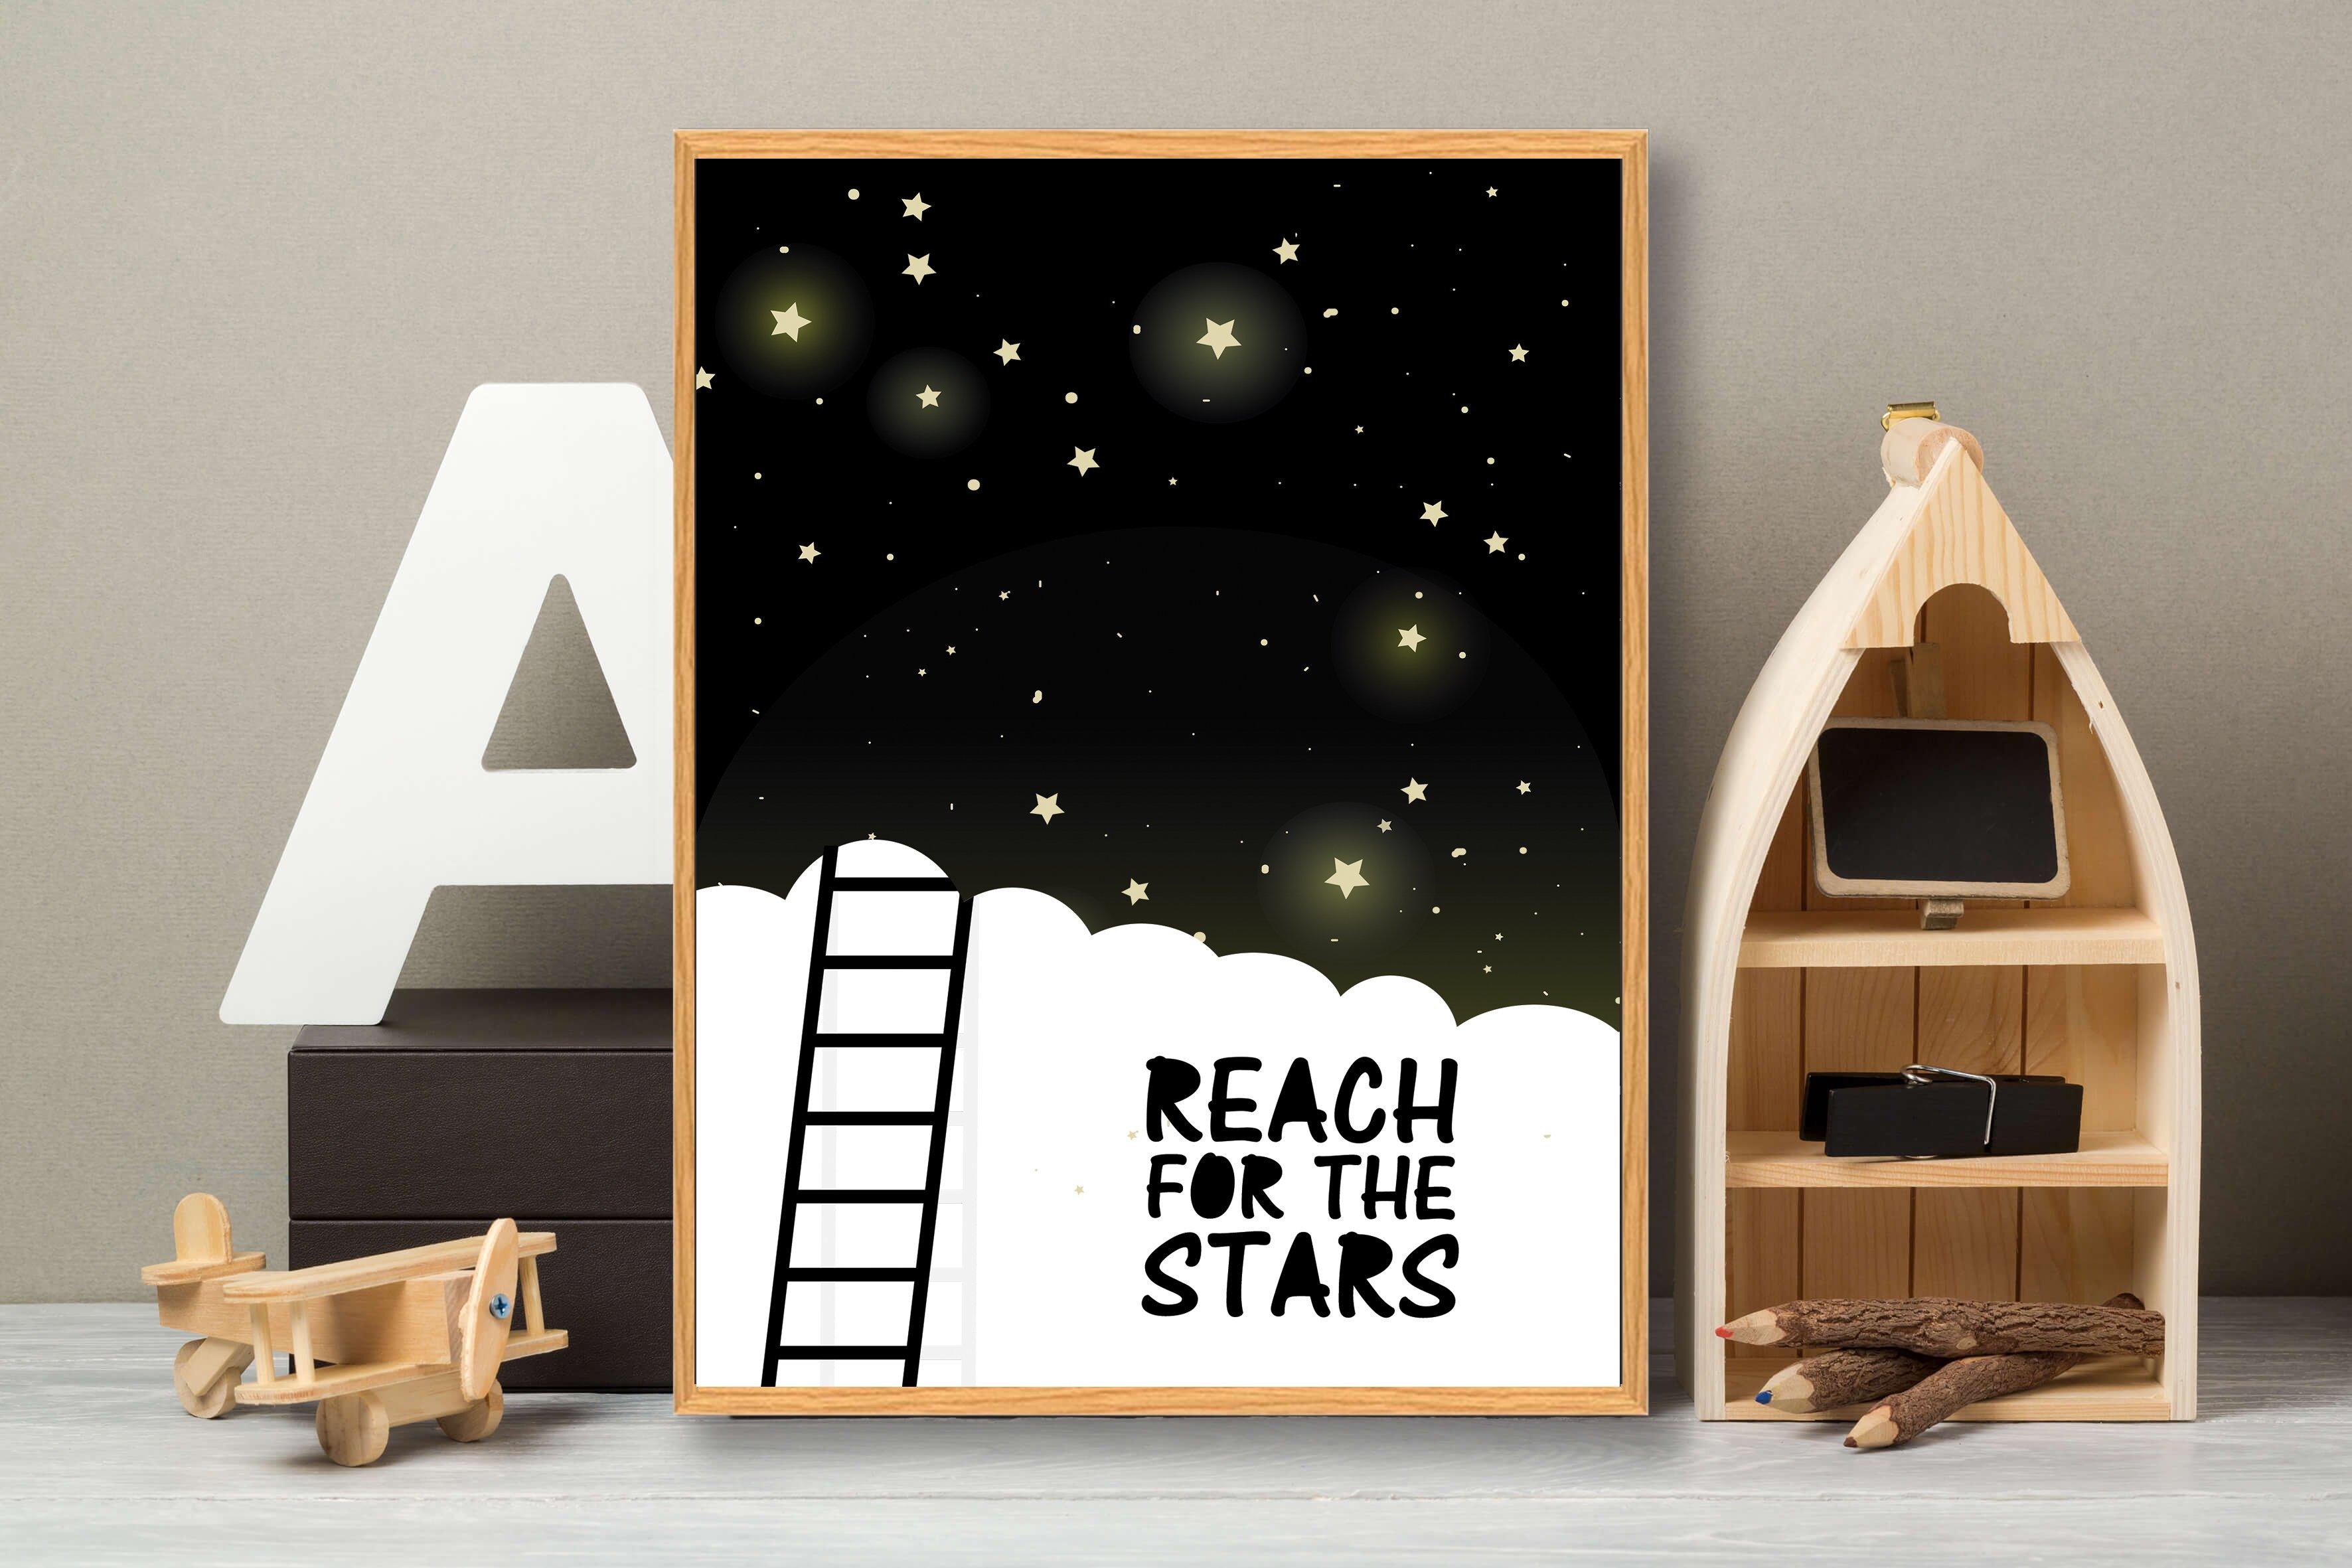 stjerne-gave-plakat-3